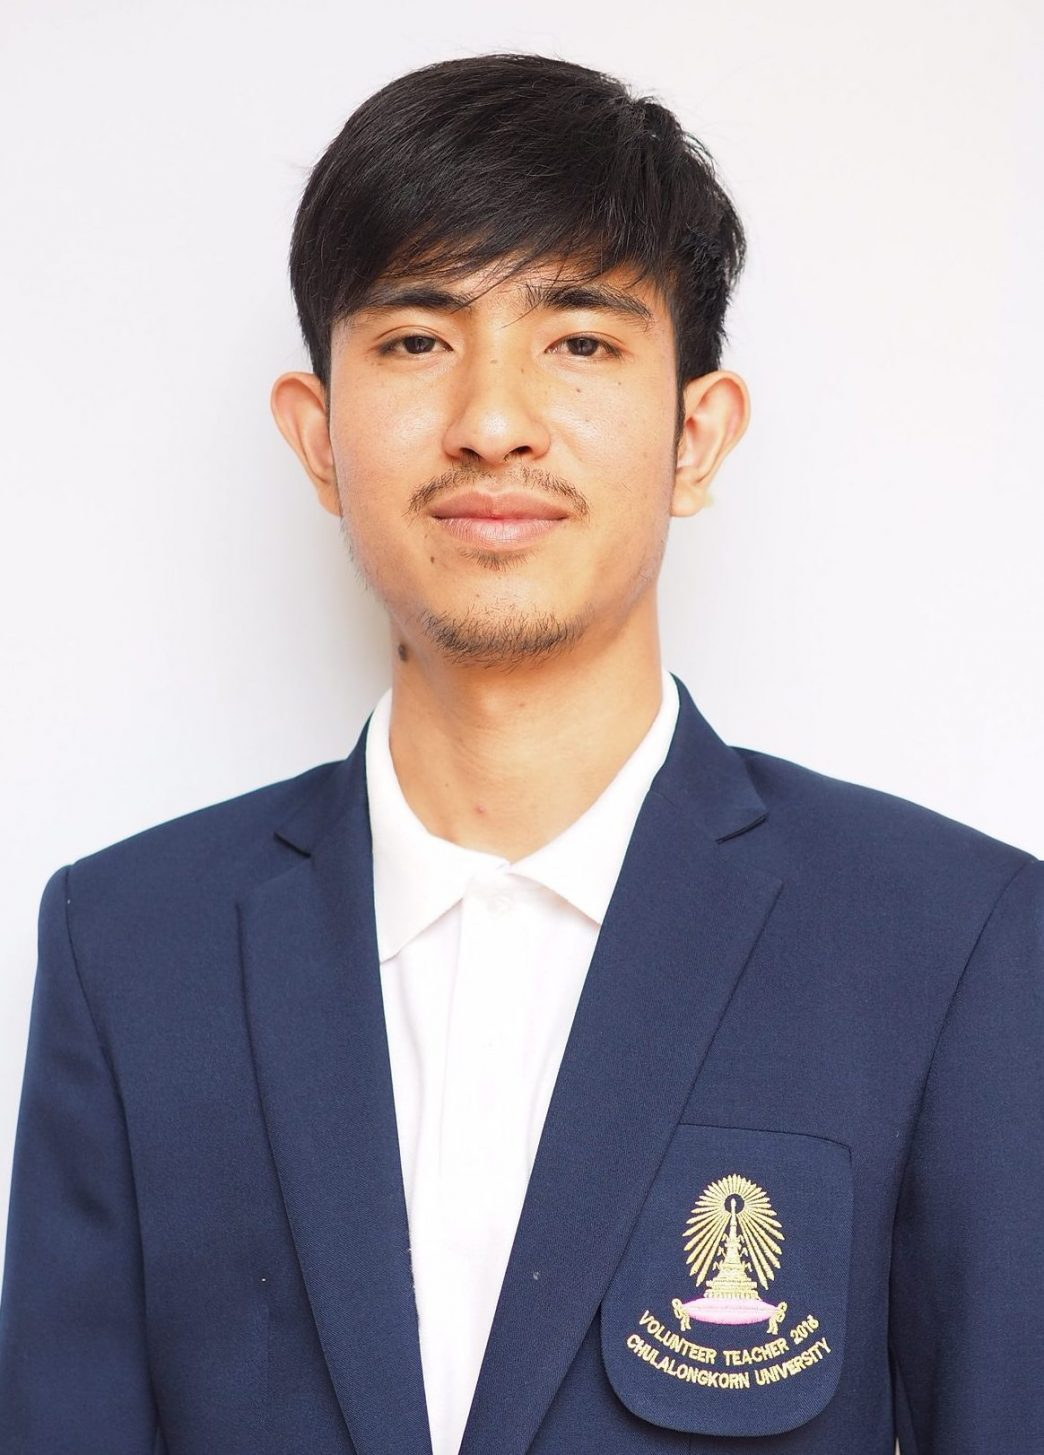 Mr. boonyarit Boonyeam <br>(Kru Tae)<br>วิชาดนตรีไทย (2019)